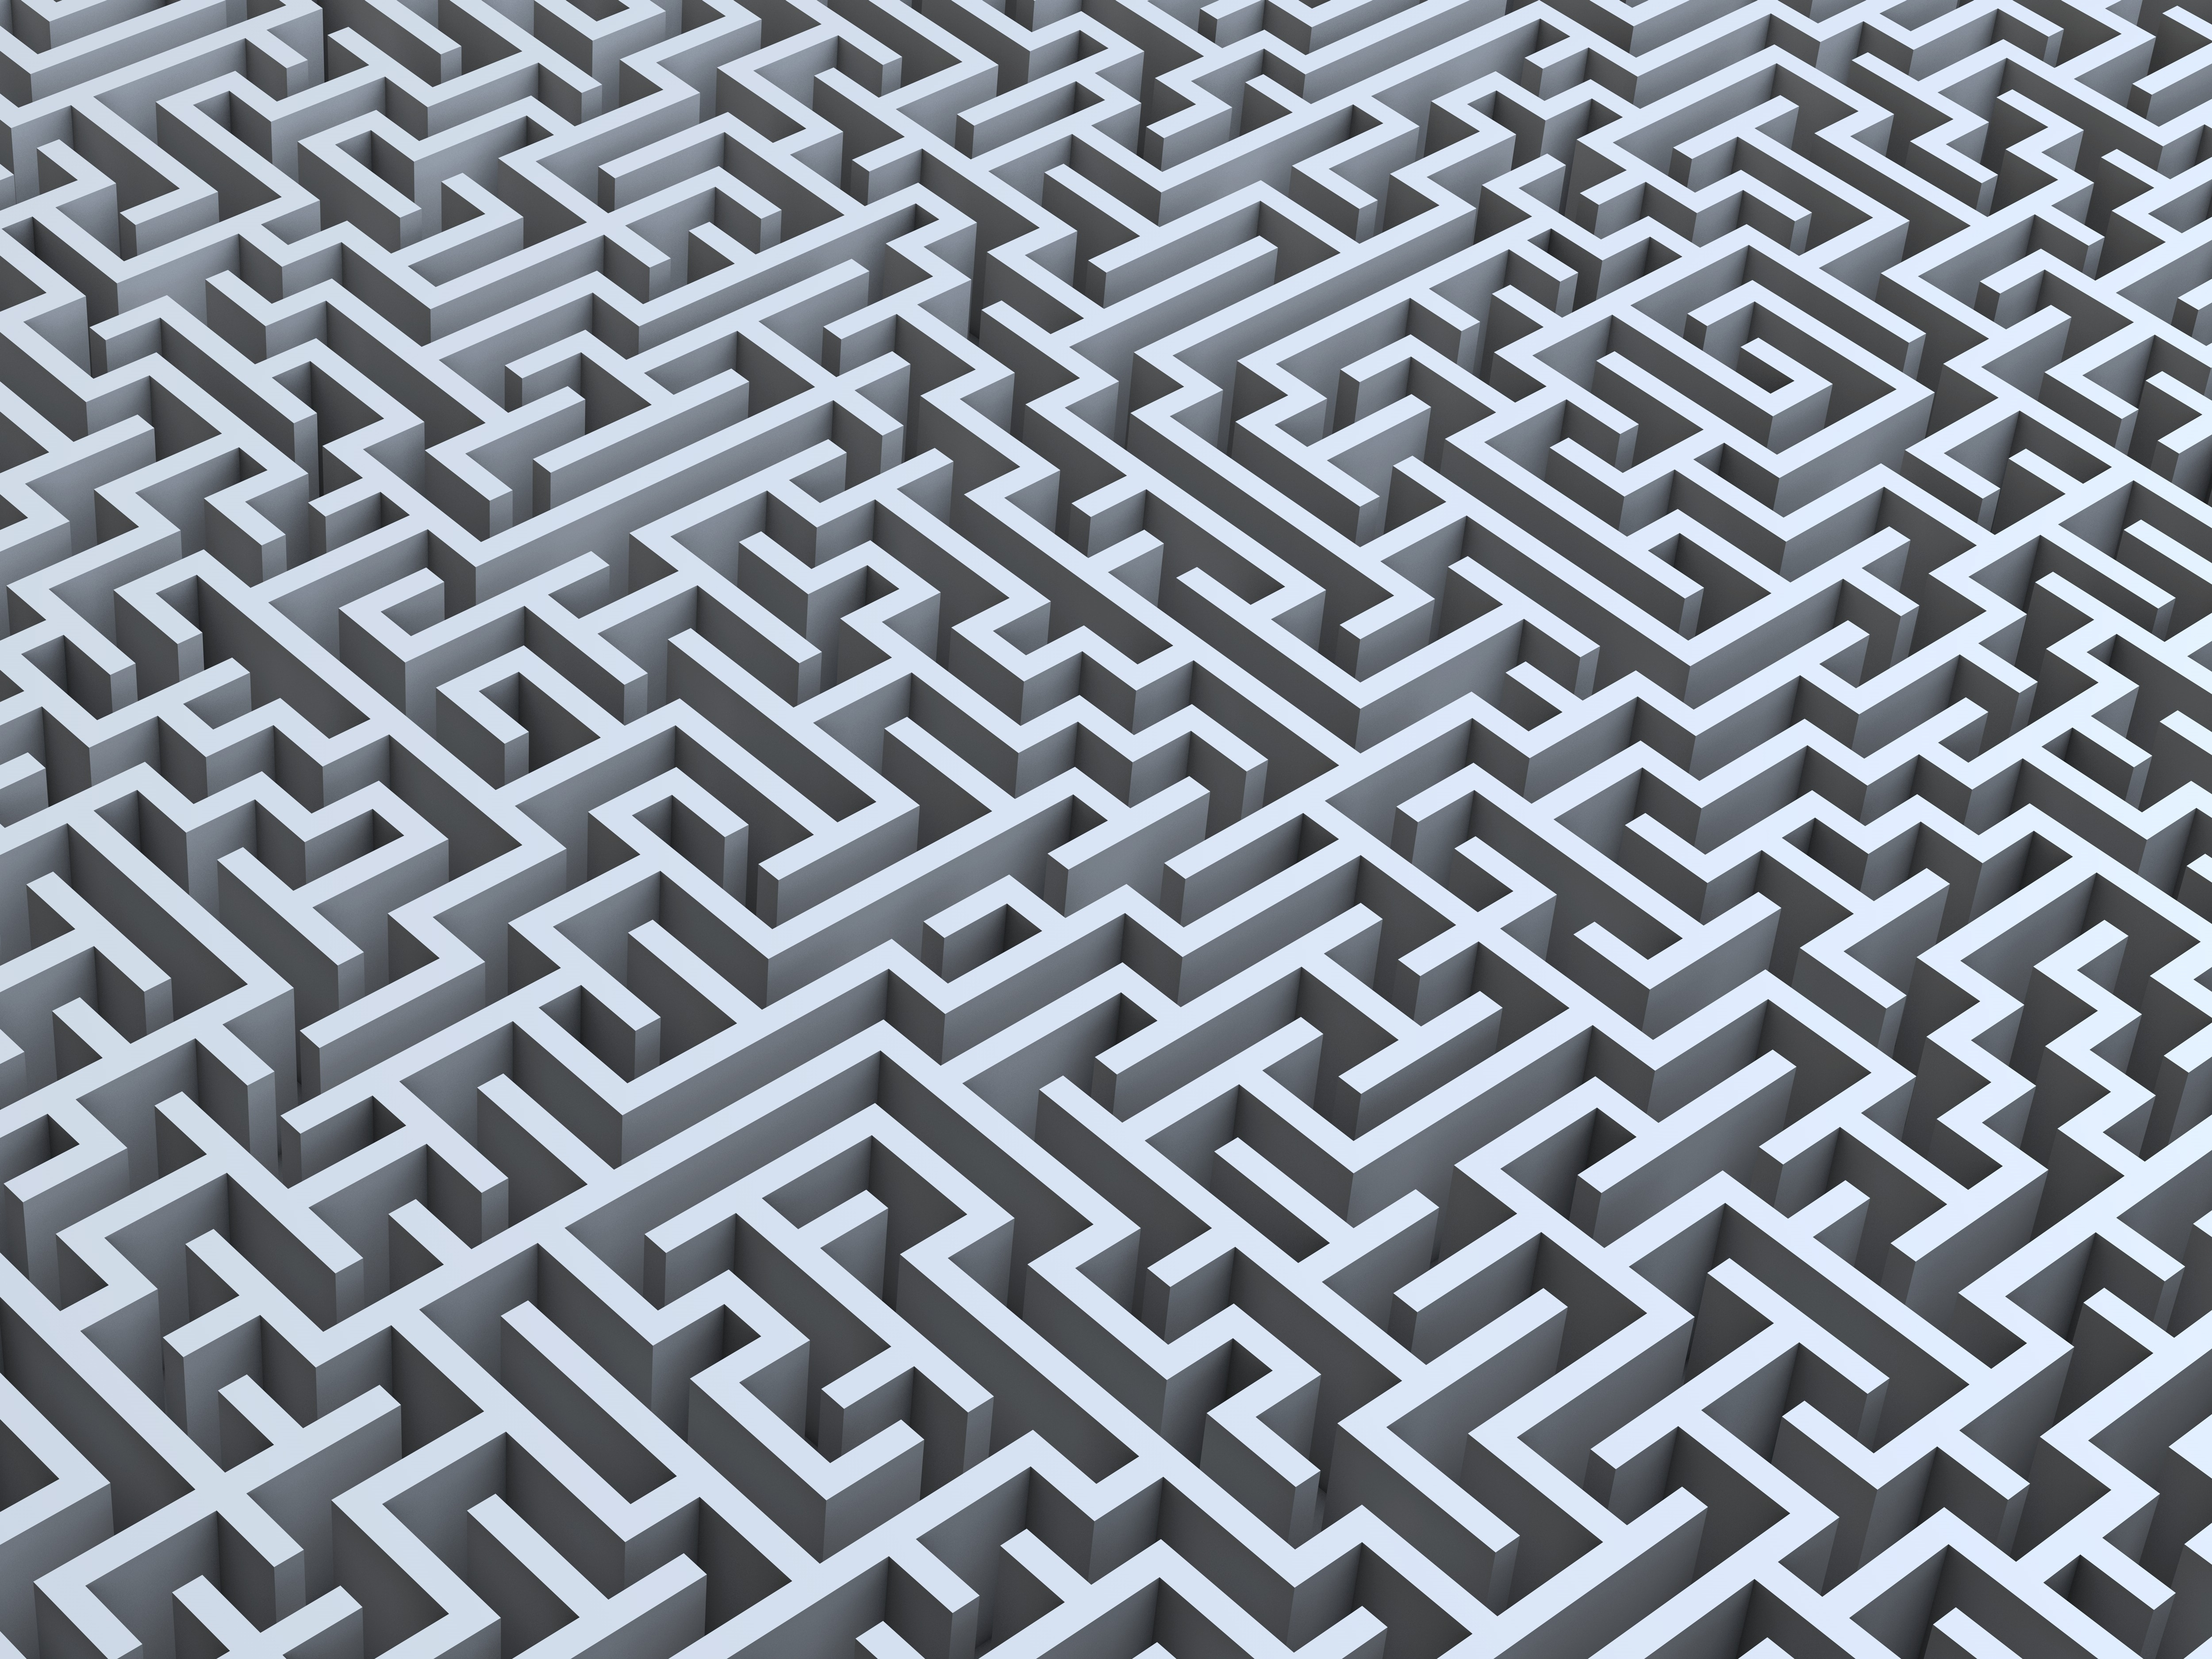 Maze, labyrinth, artwork